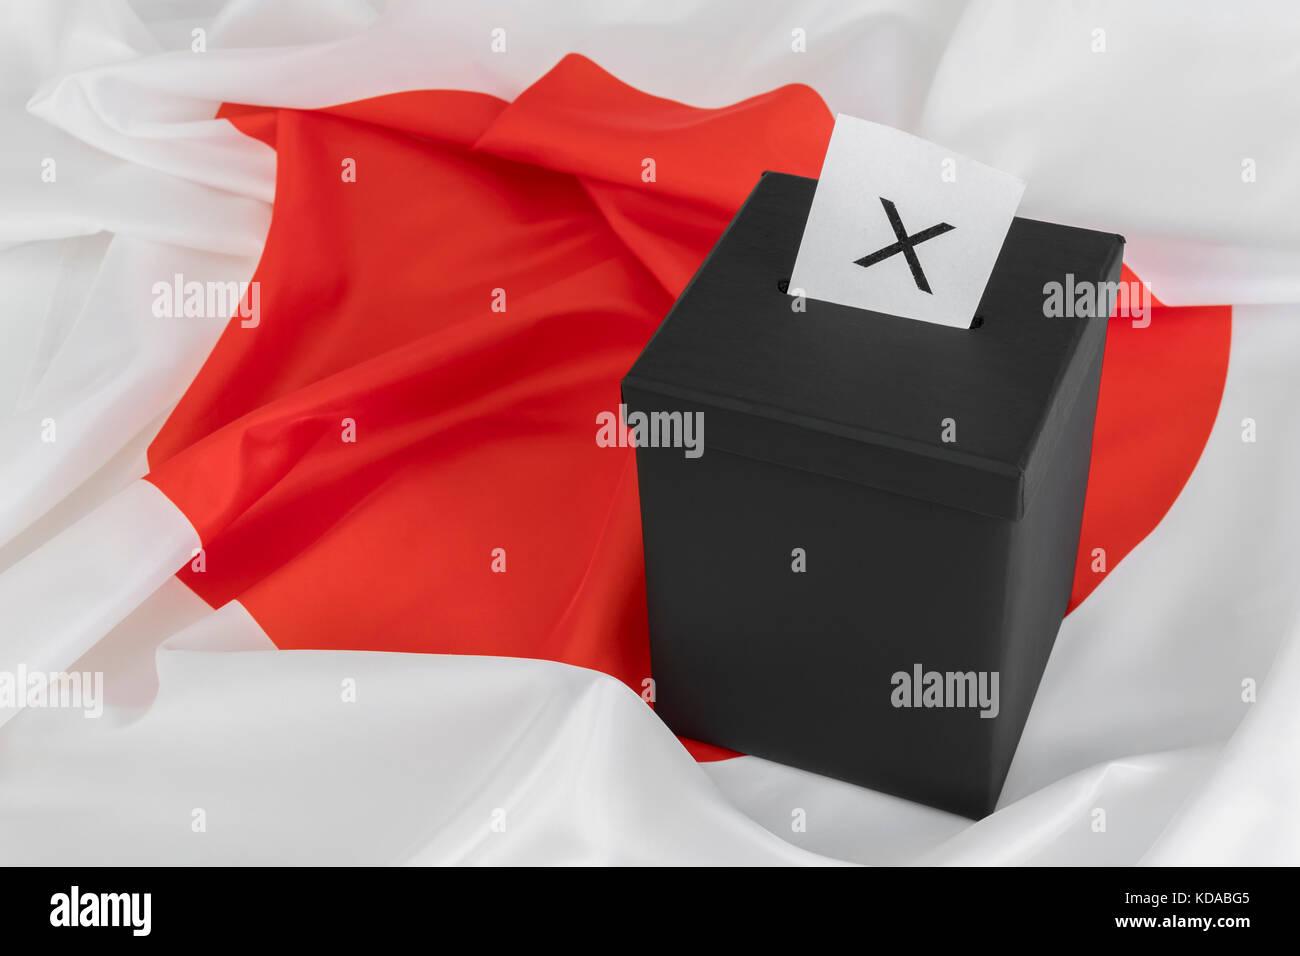 Japanese 'Circle of the Sun' / 'Rising Sun' flag with black ballot box - as metaphor for Japanese - Stock Image